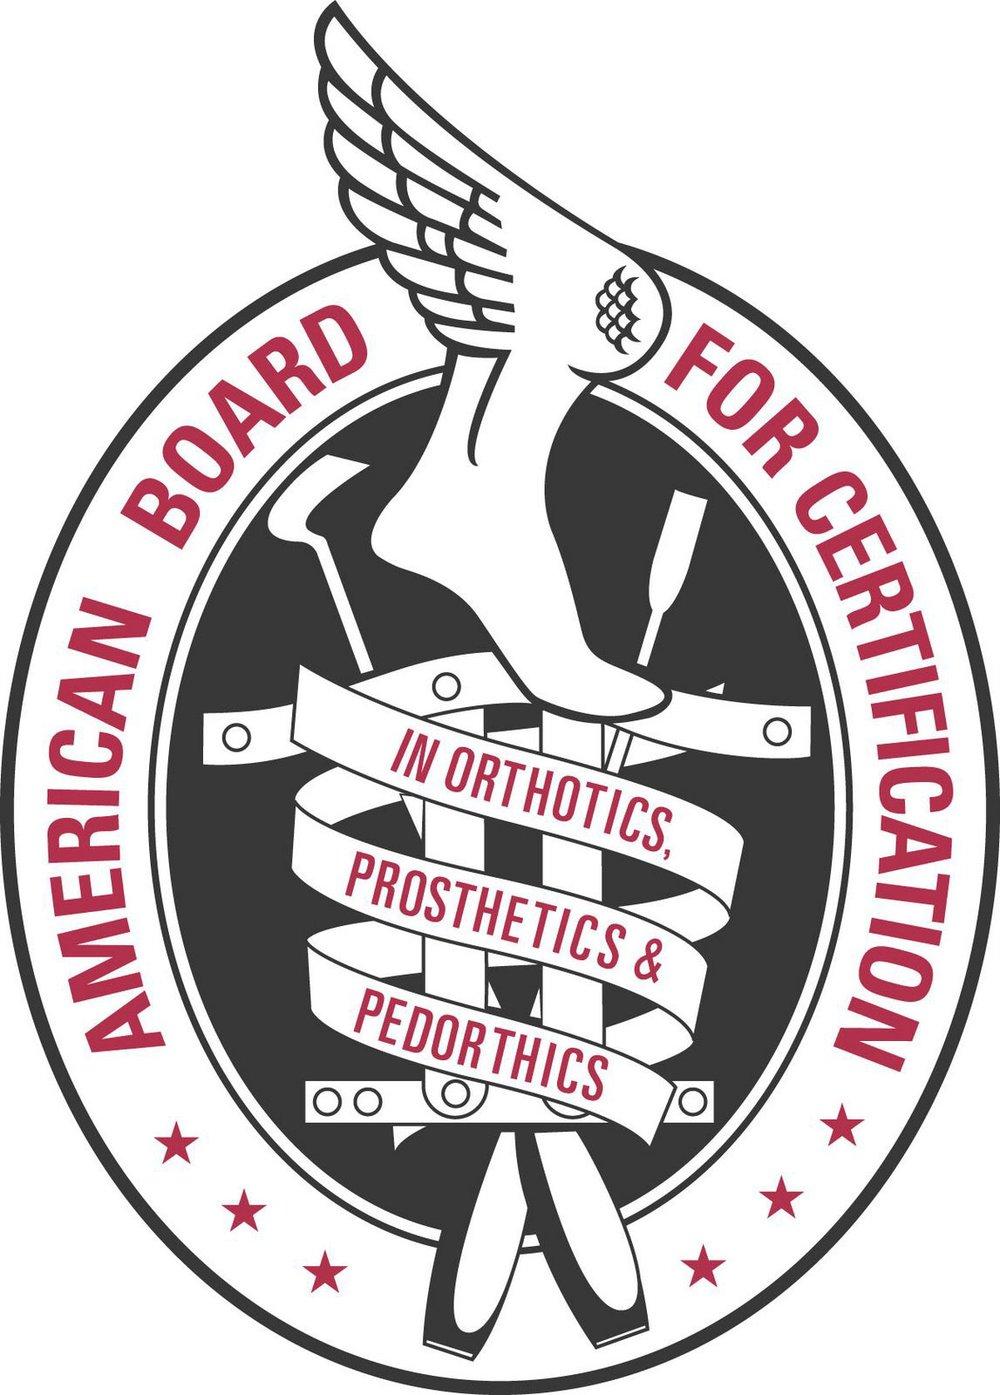 abc_logo-740244[1].jpg